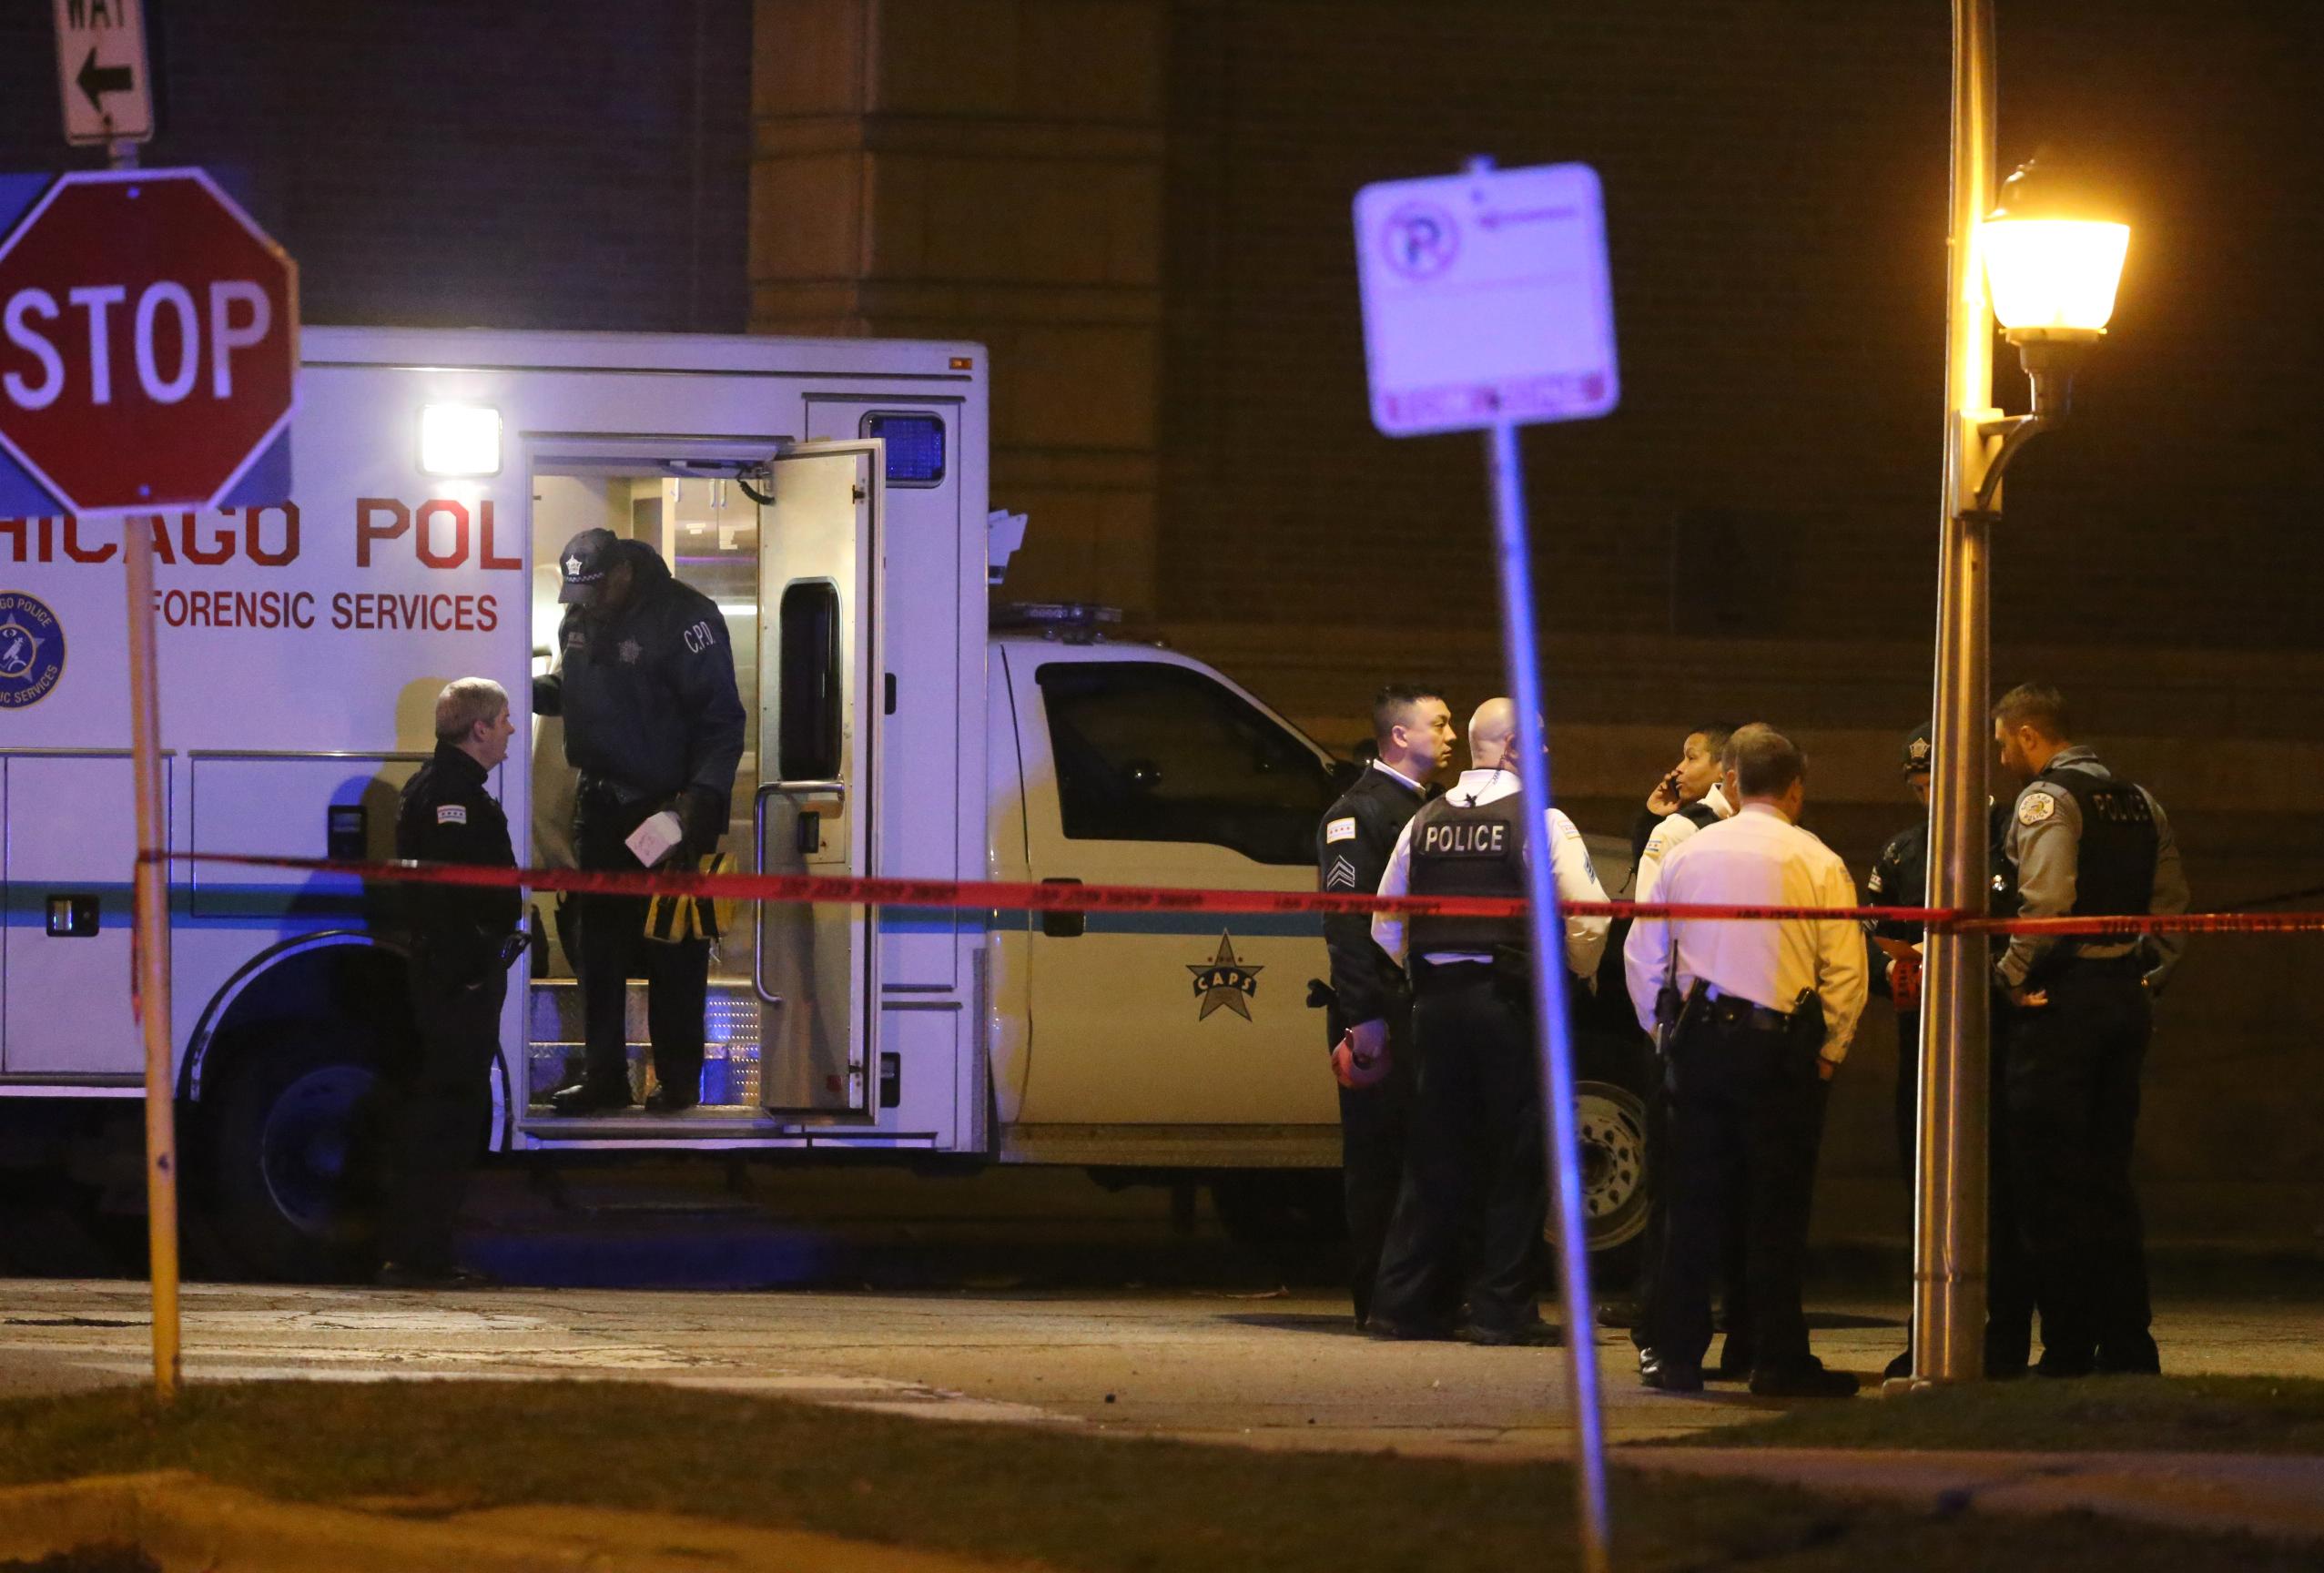 Chicago Police Investigate Racial Slurs Made Over Police Dispatch Radio (WARNING: Explicit language)